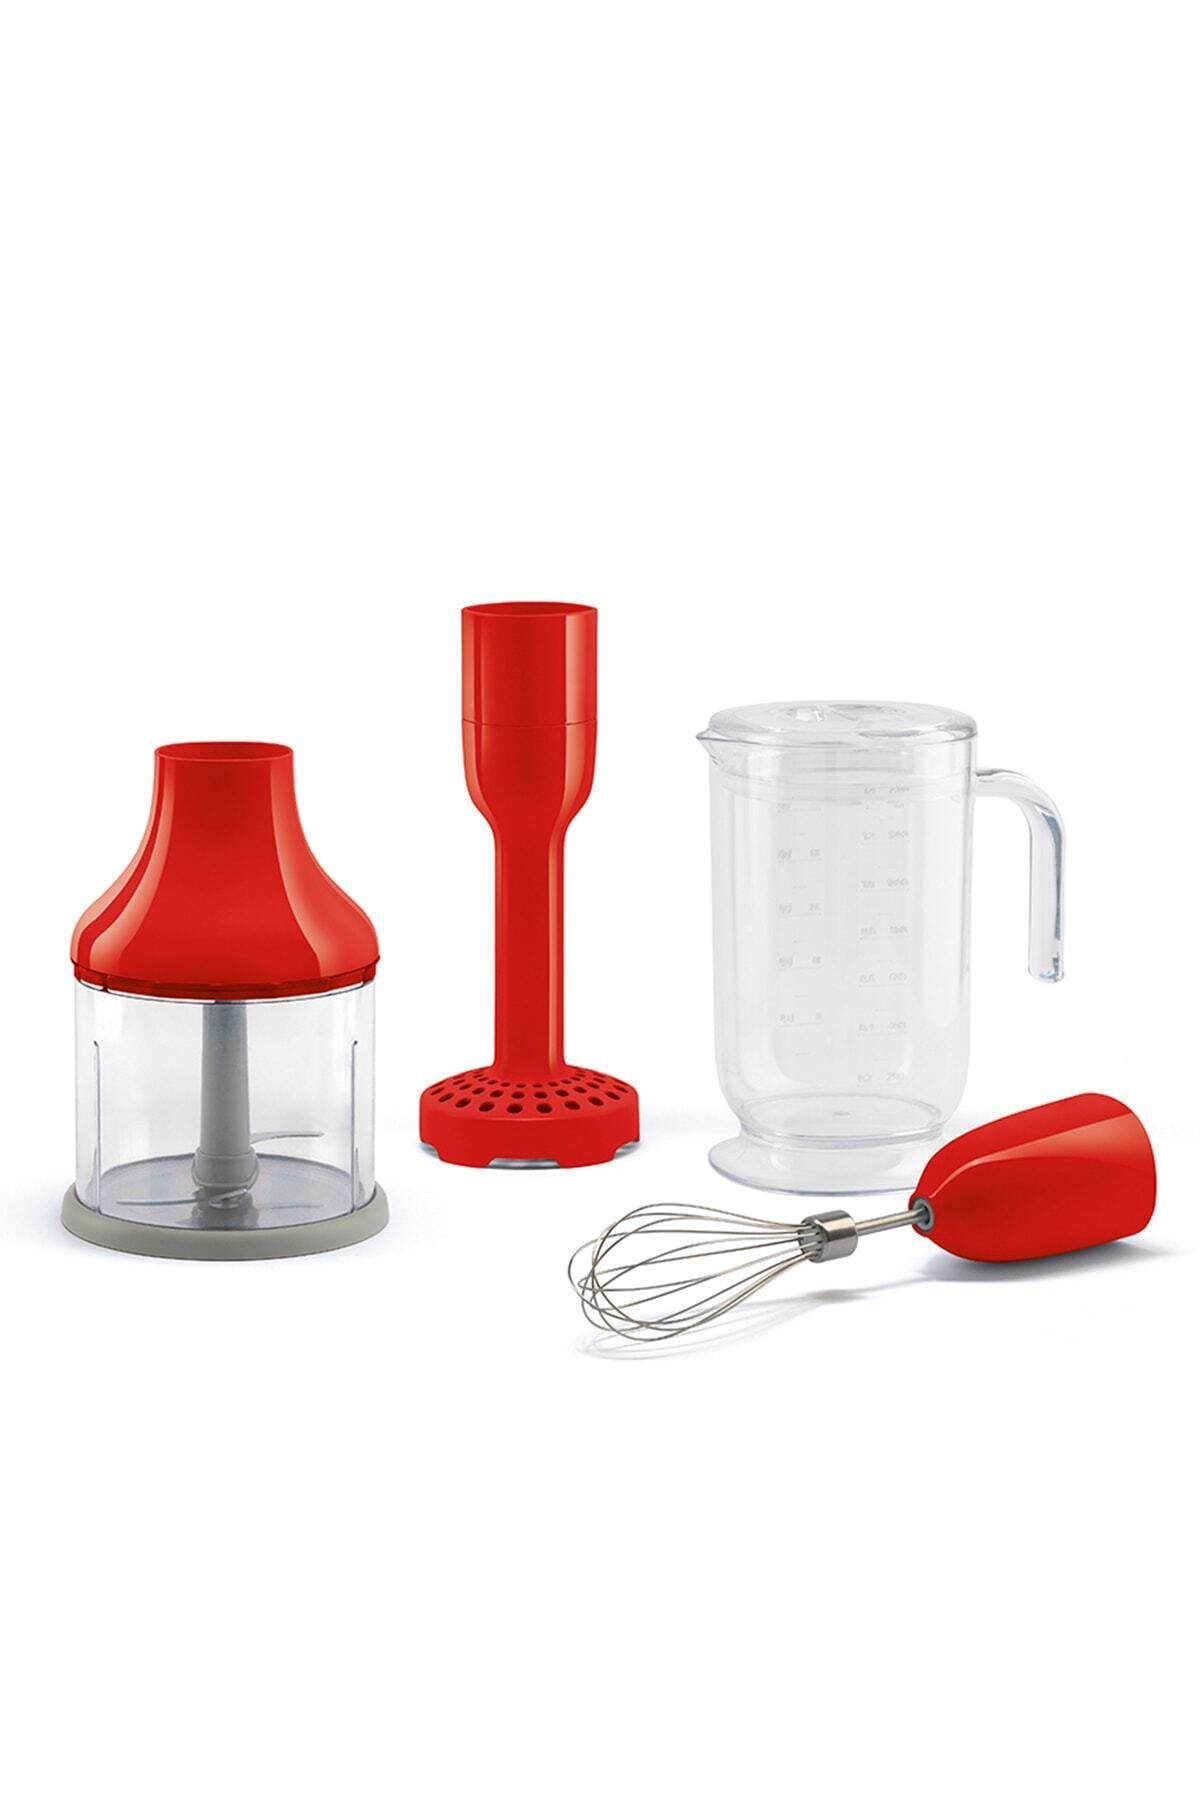 SMEG Kırmızı Paslanmaz Çelik El Blenderi Hbf02rdeu 2